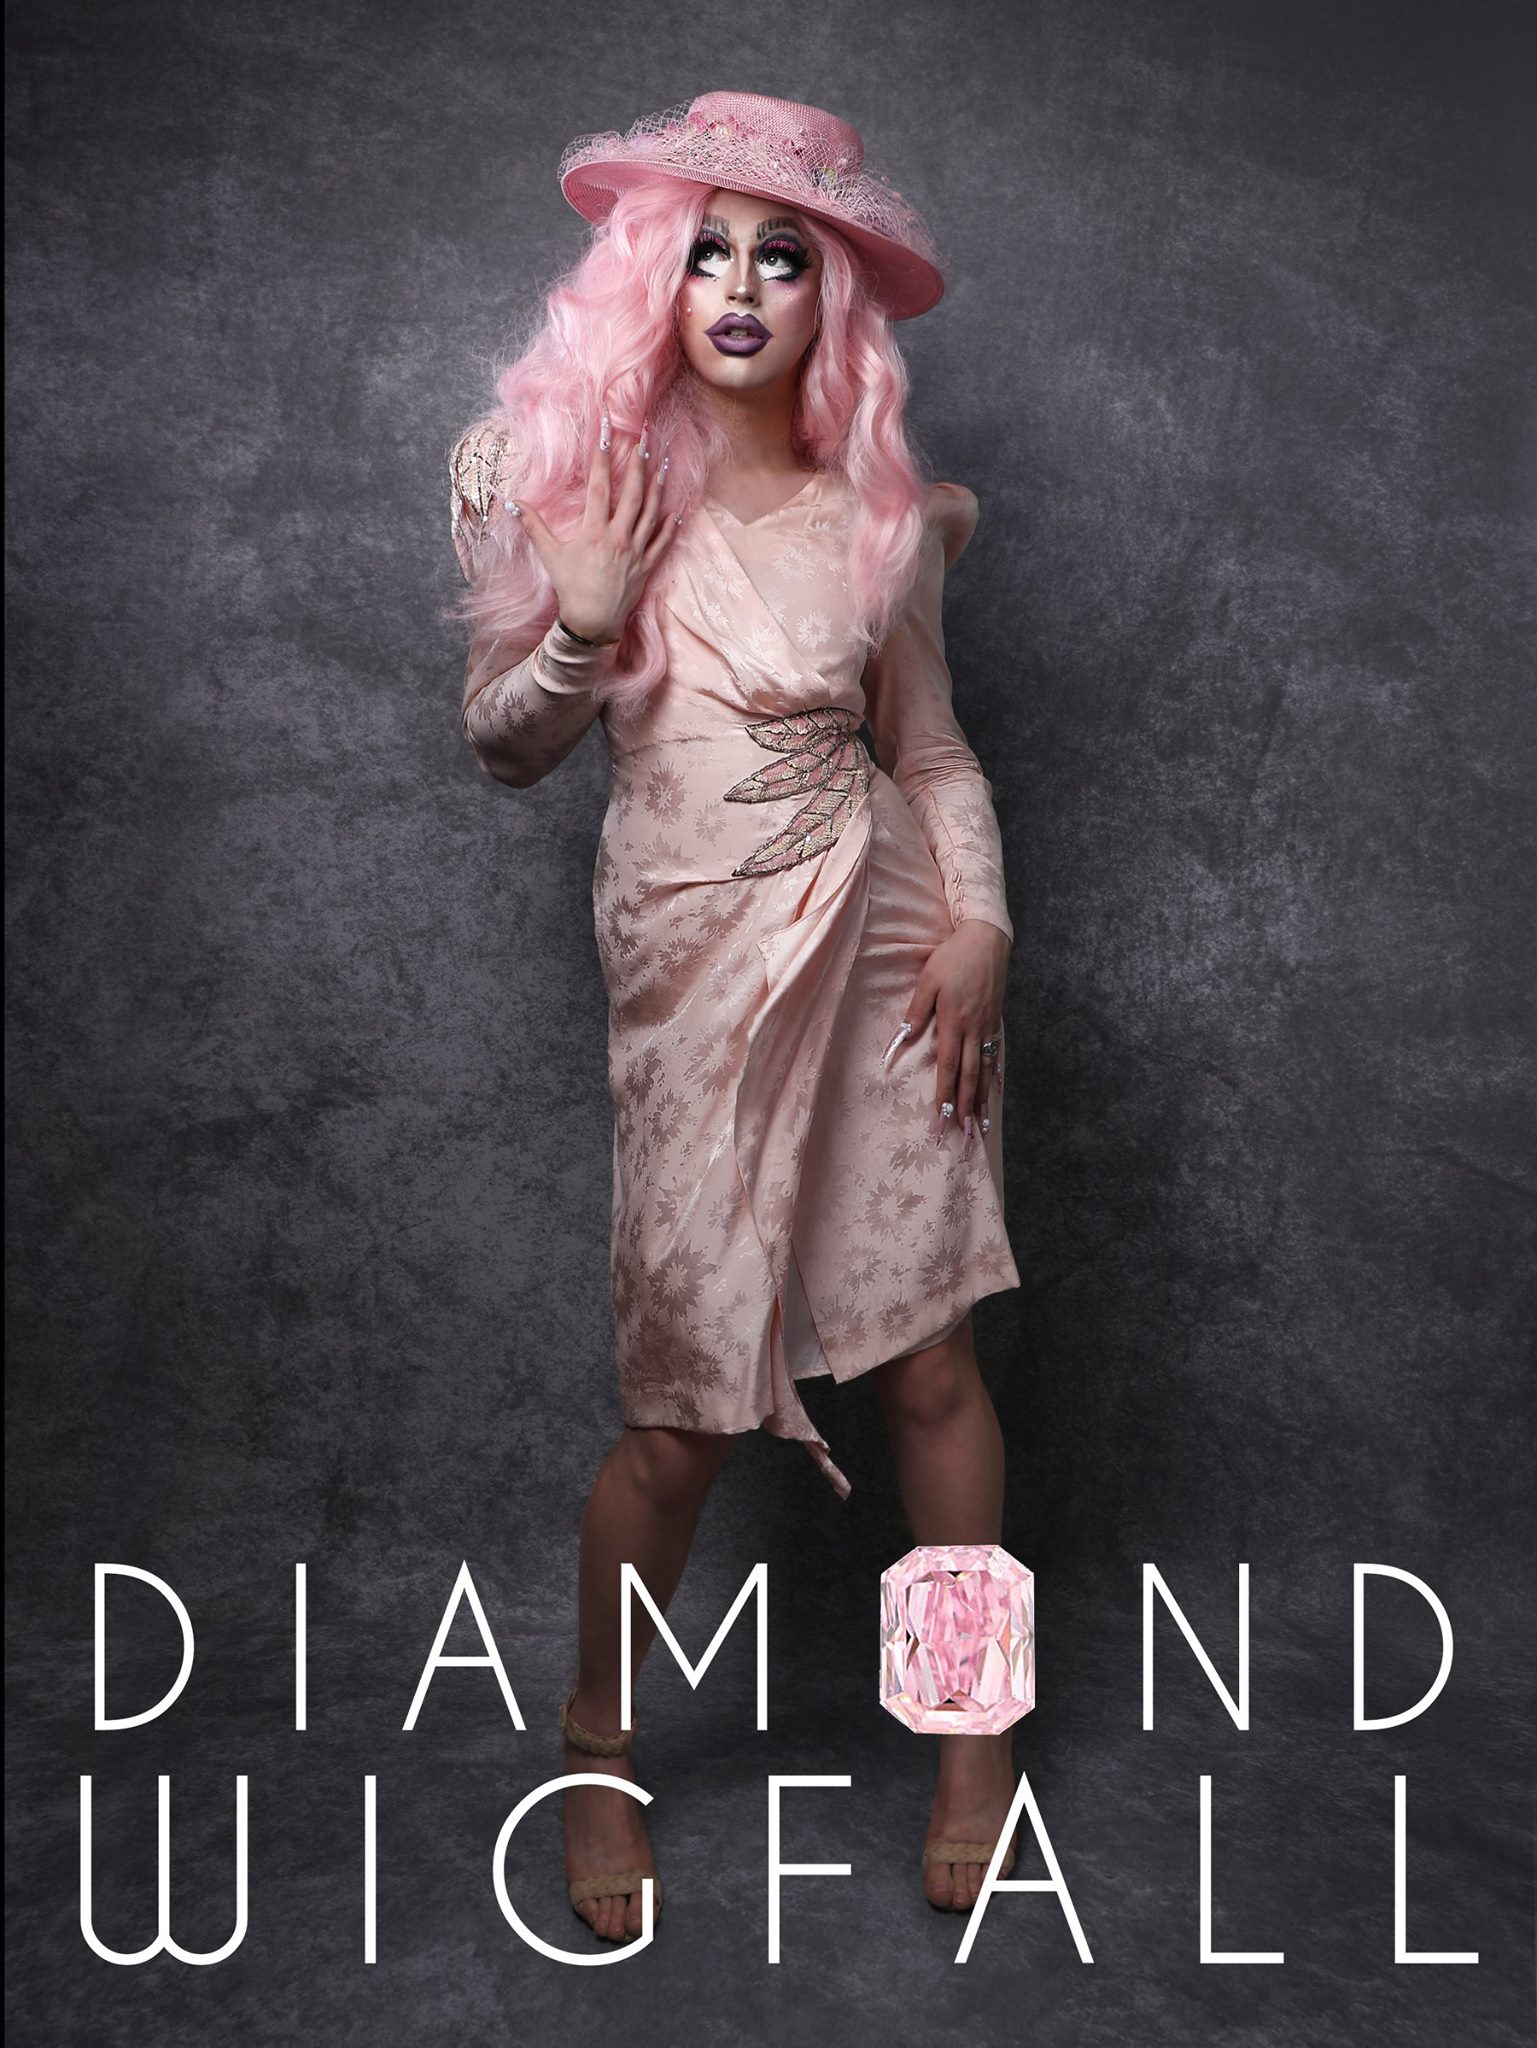 Diamond Wigfall - Photo by James Michael Avance